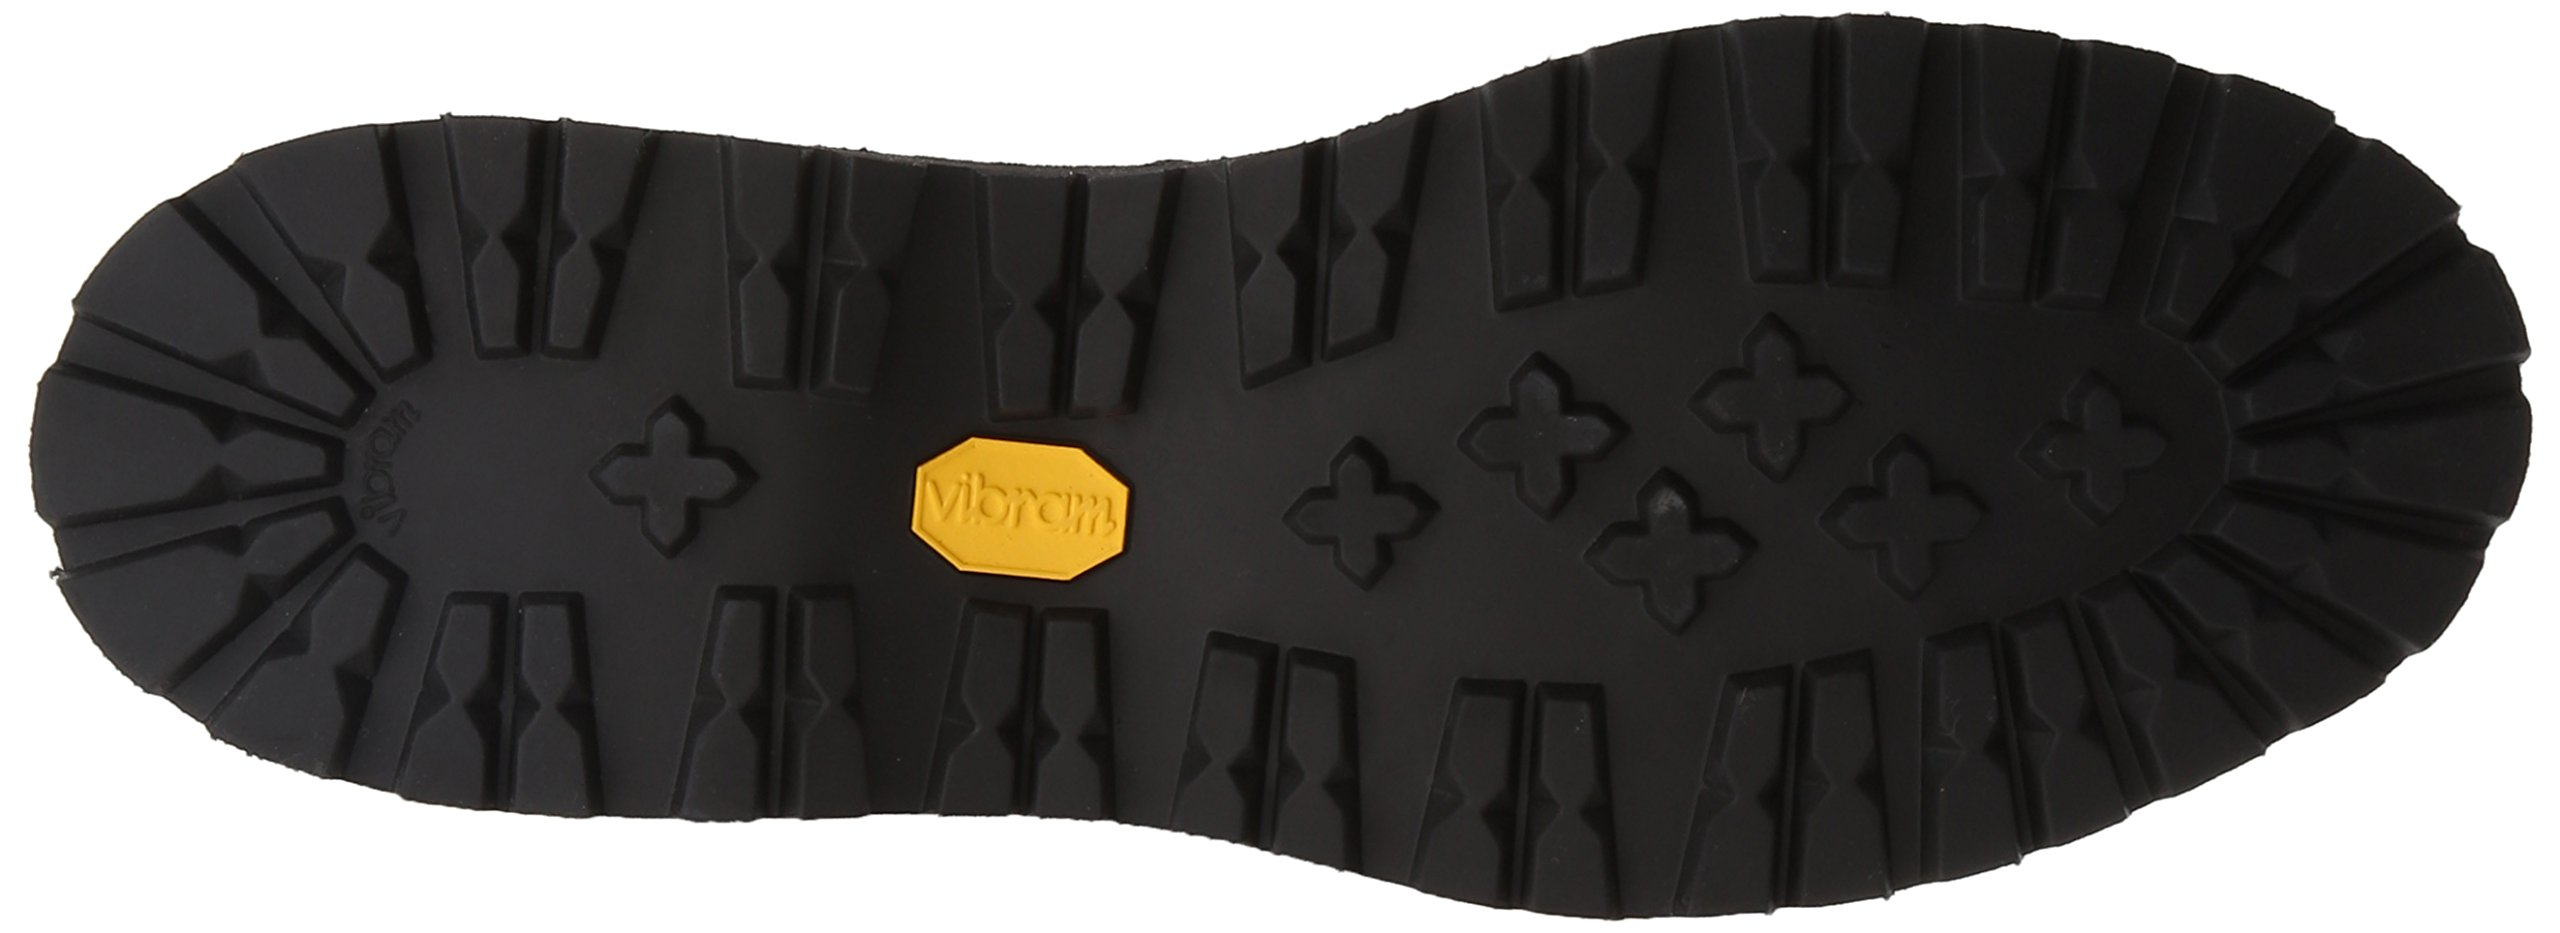 Danner Men's Acadia 8'' 200G Military and Tactical Boot, Black, 13 B US by Danner (Image #3)